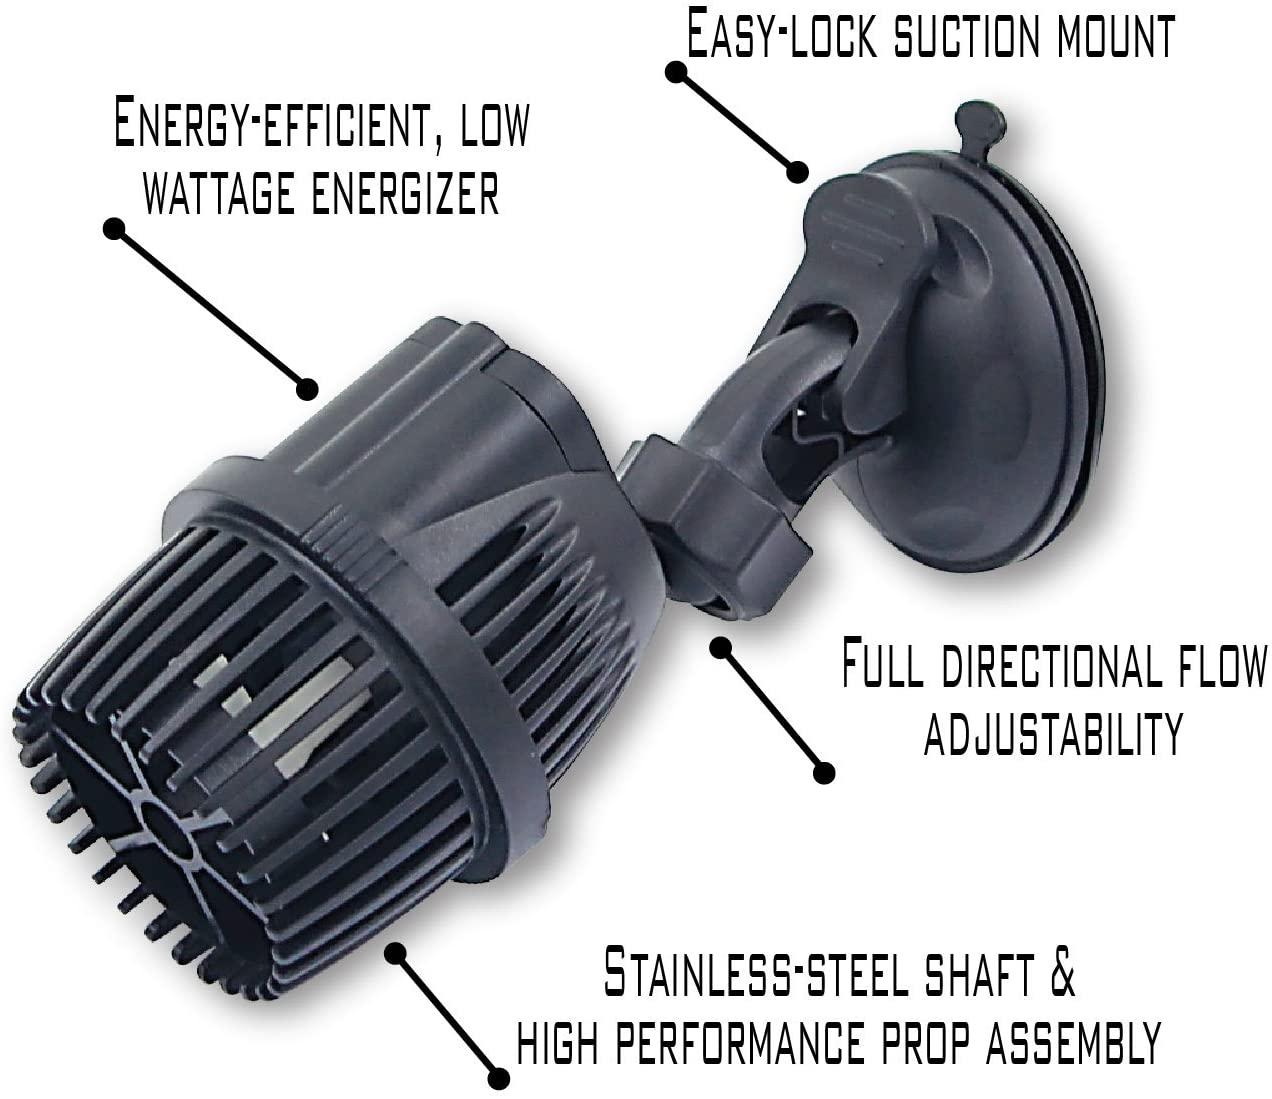 EA Performance Circulation Pump [1320-GPH] with Heavey Duty Suction Mount